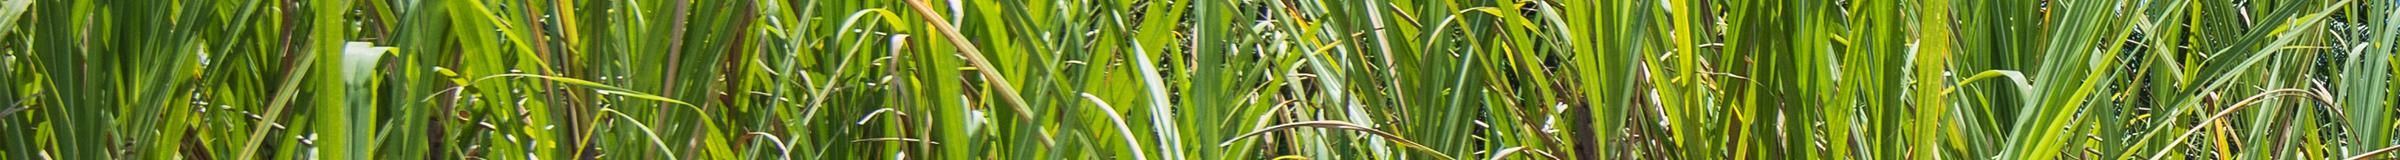 havana-sugarcane